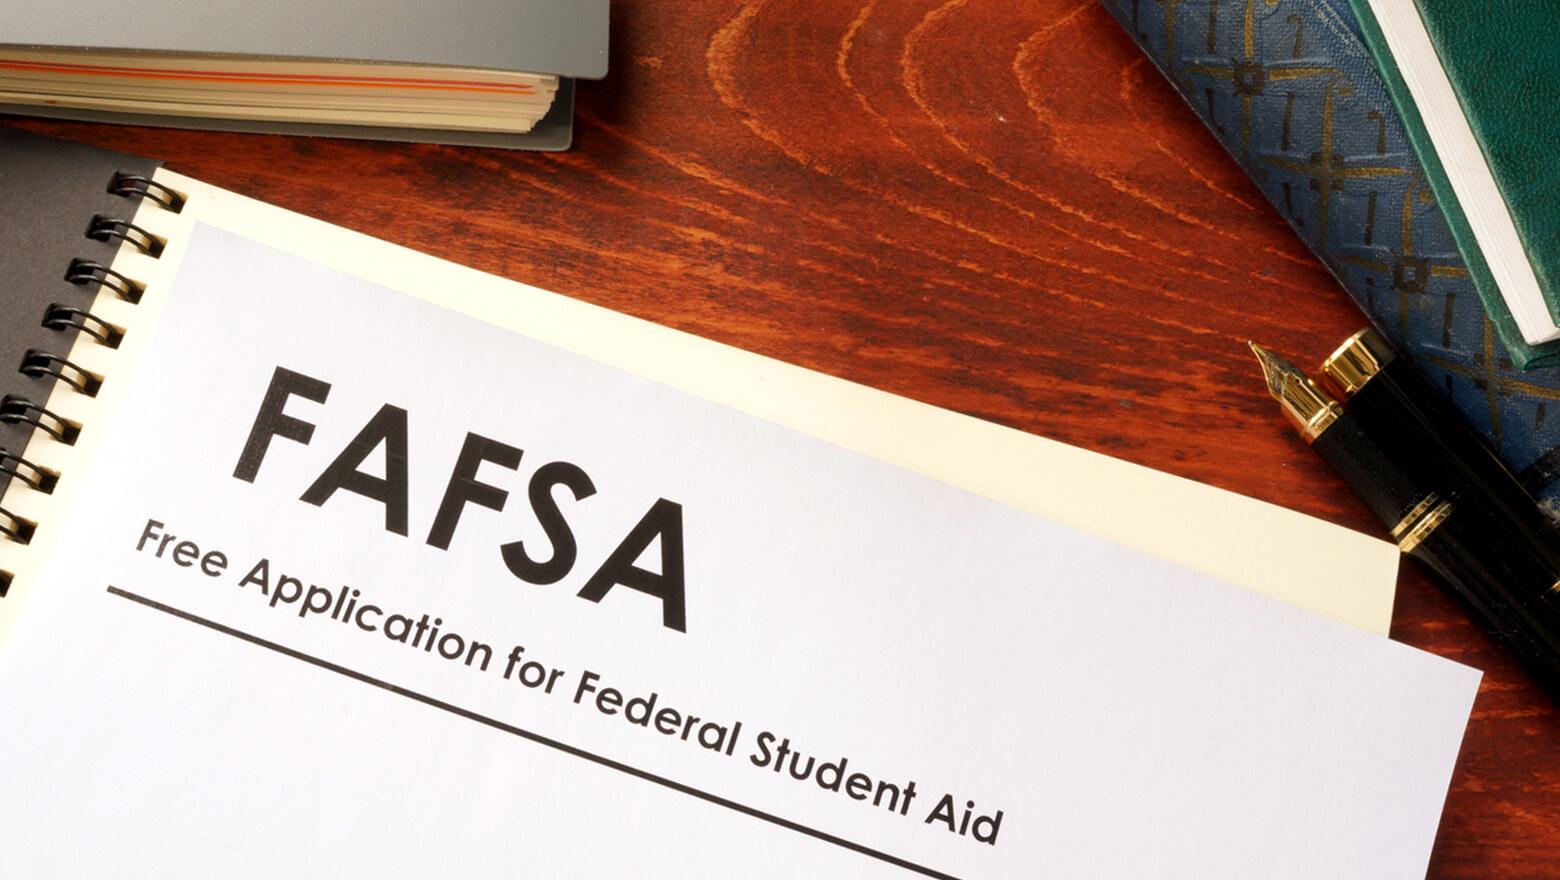 FAFSA form on desk